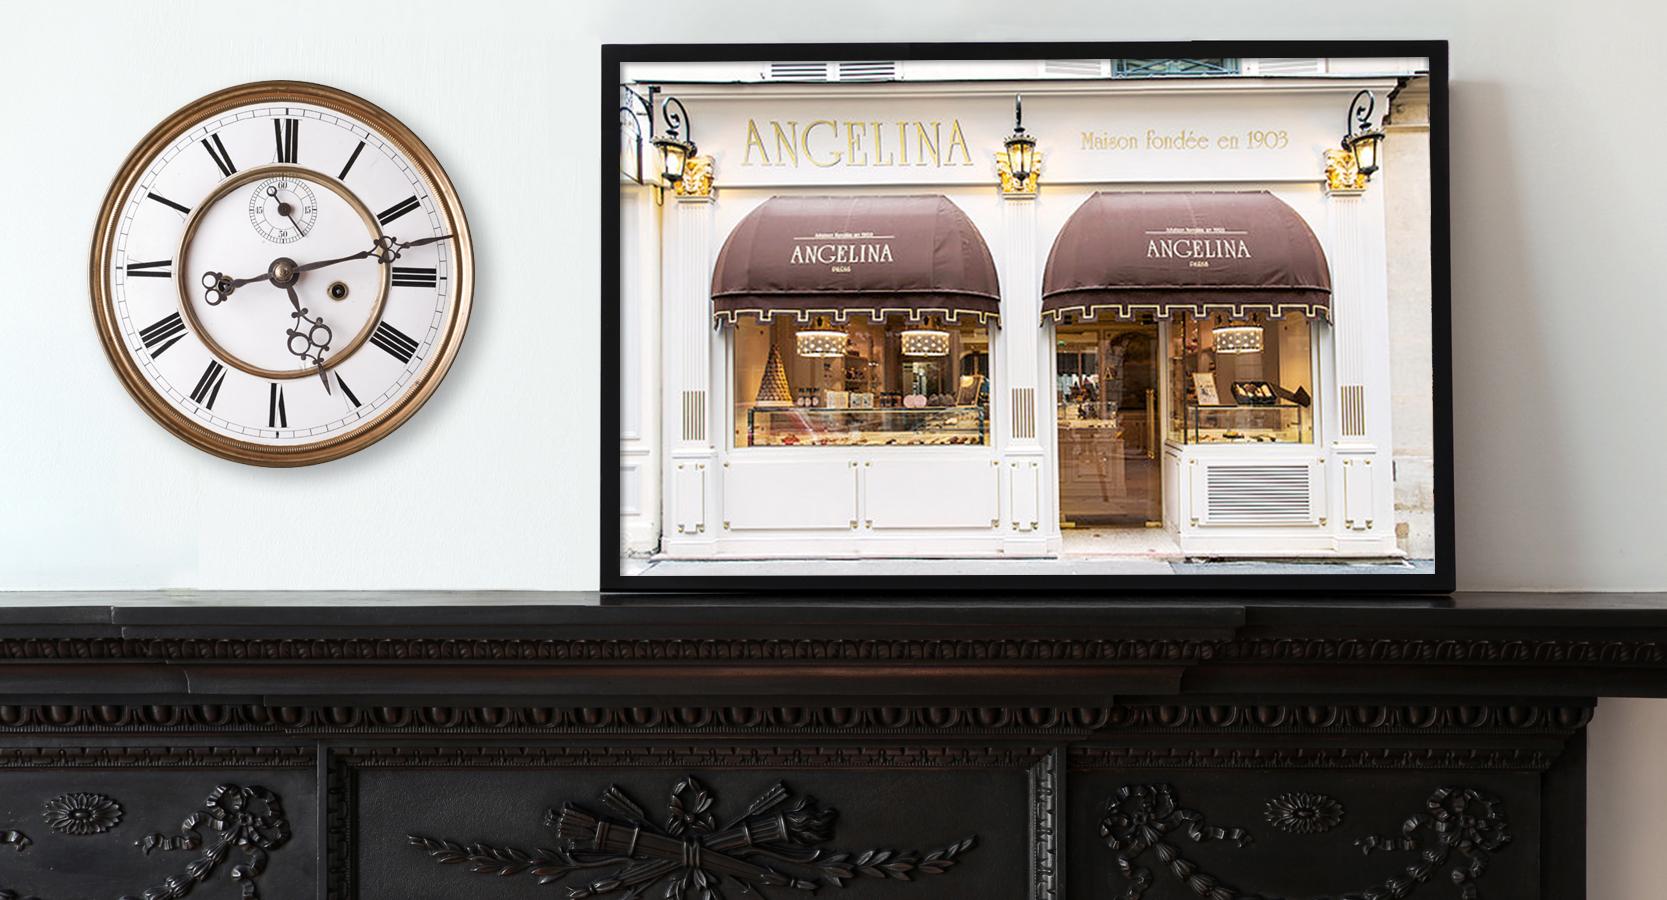 Angelina Patisserie, Paris Pastry Shop